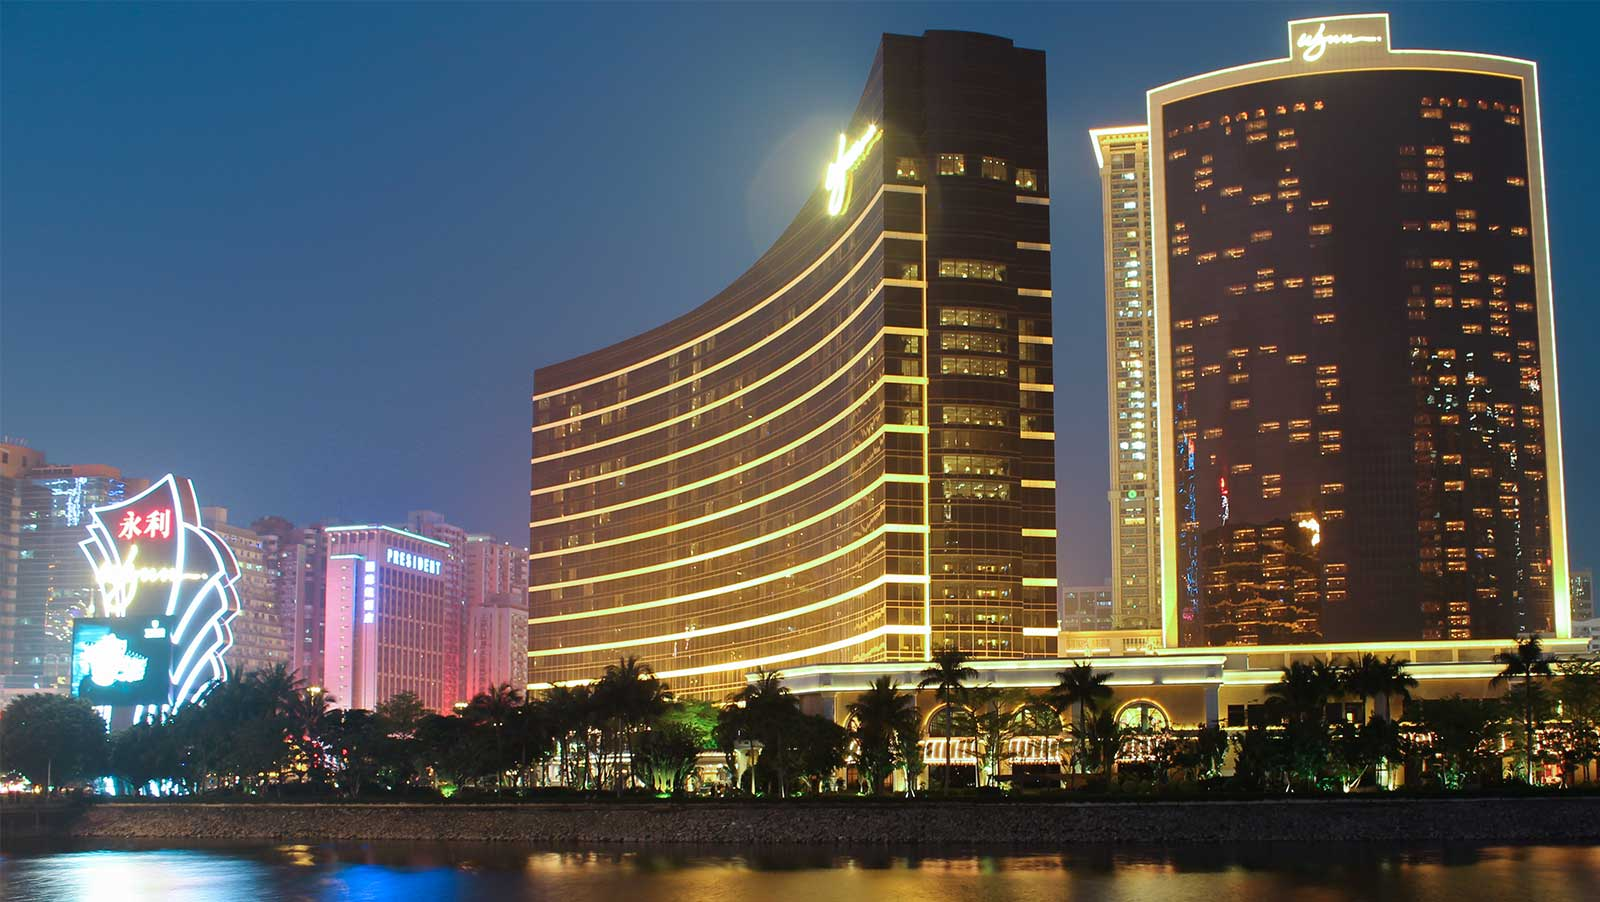 Suncity closing VIP rooms in Australia amid Crown Resorts probe